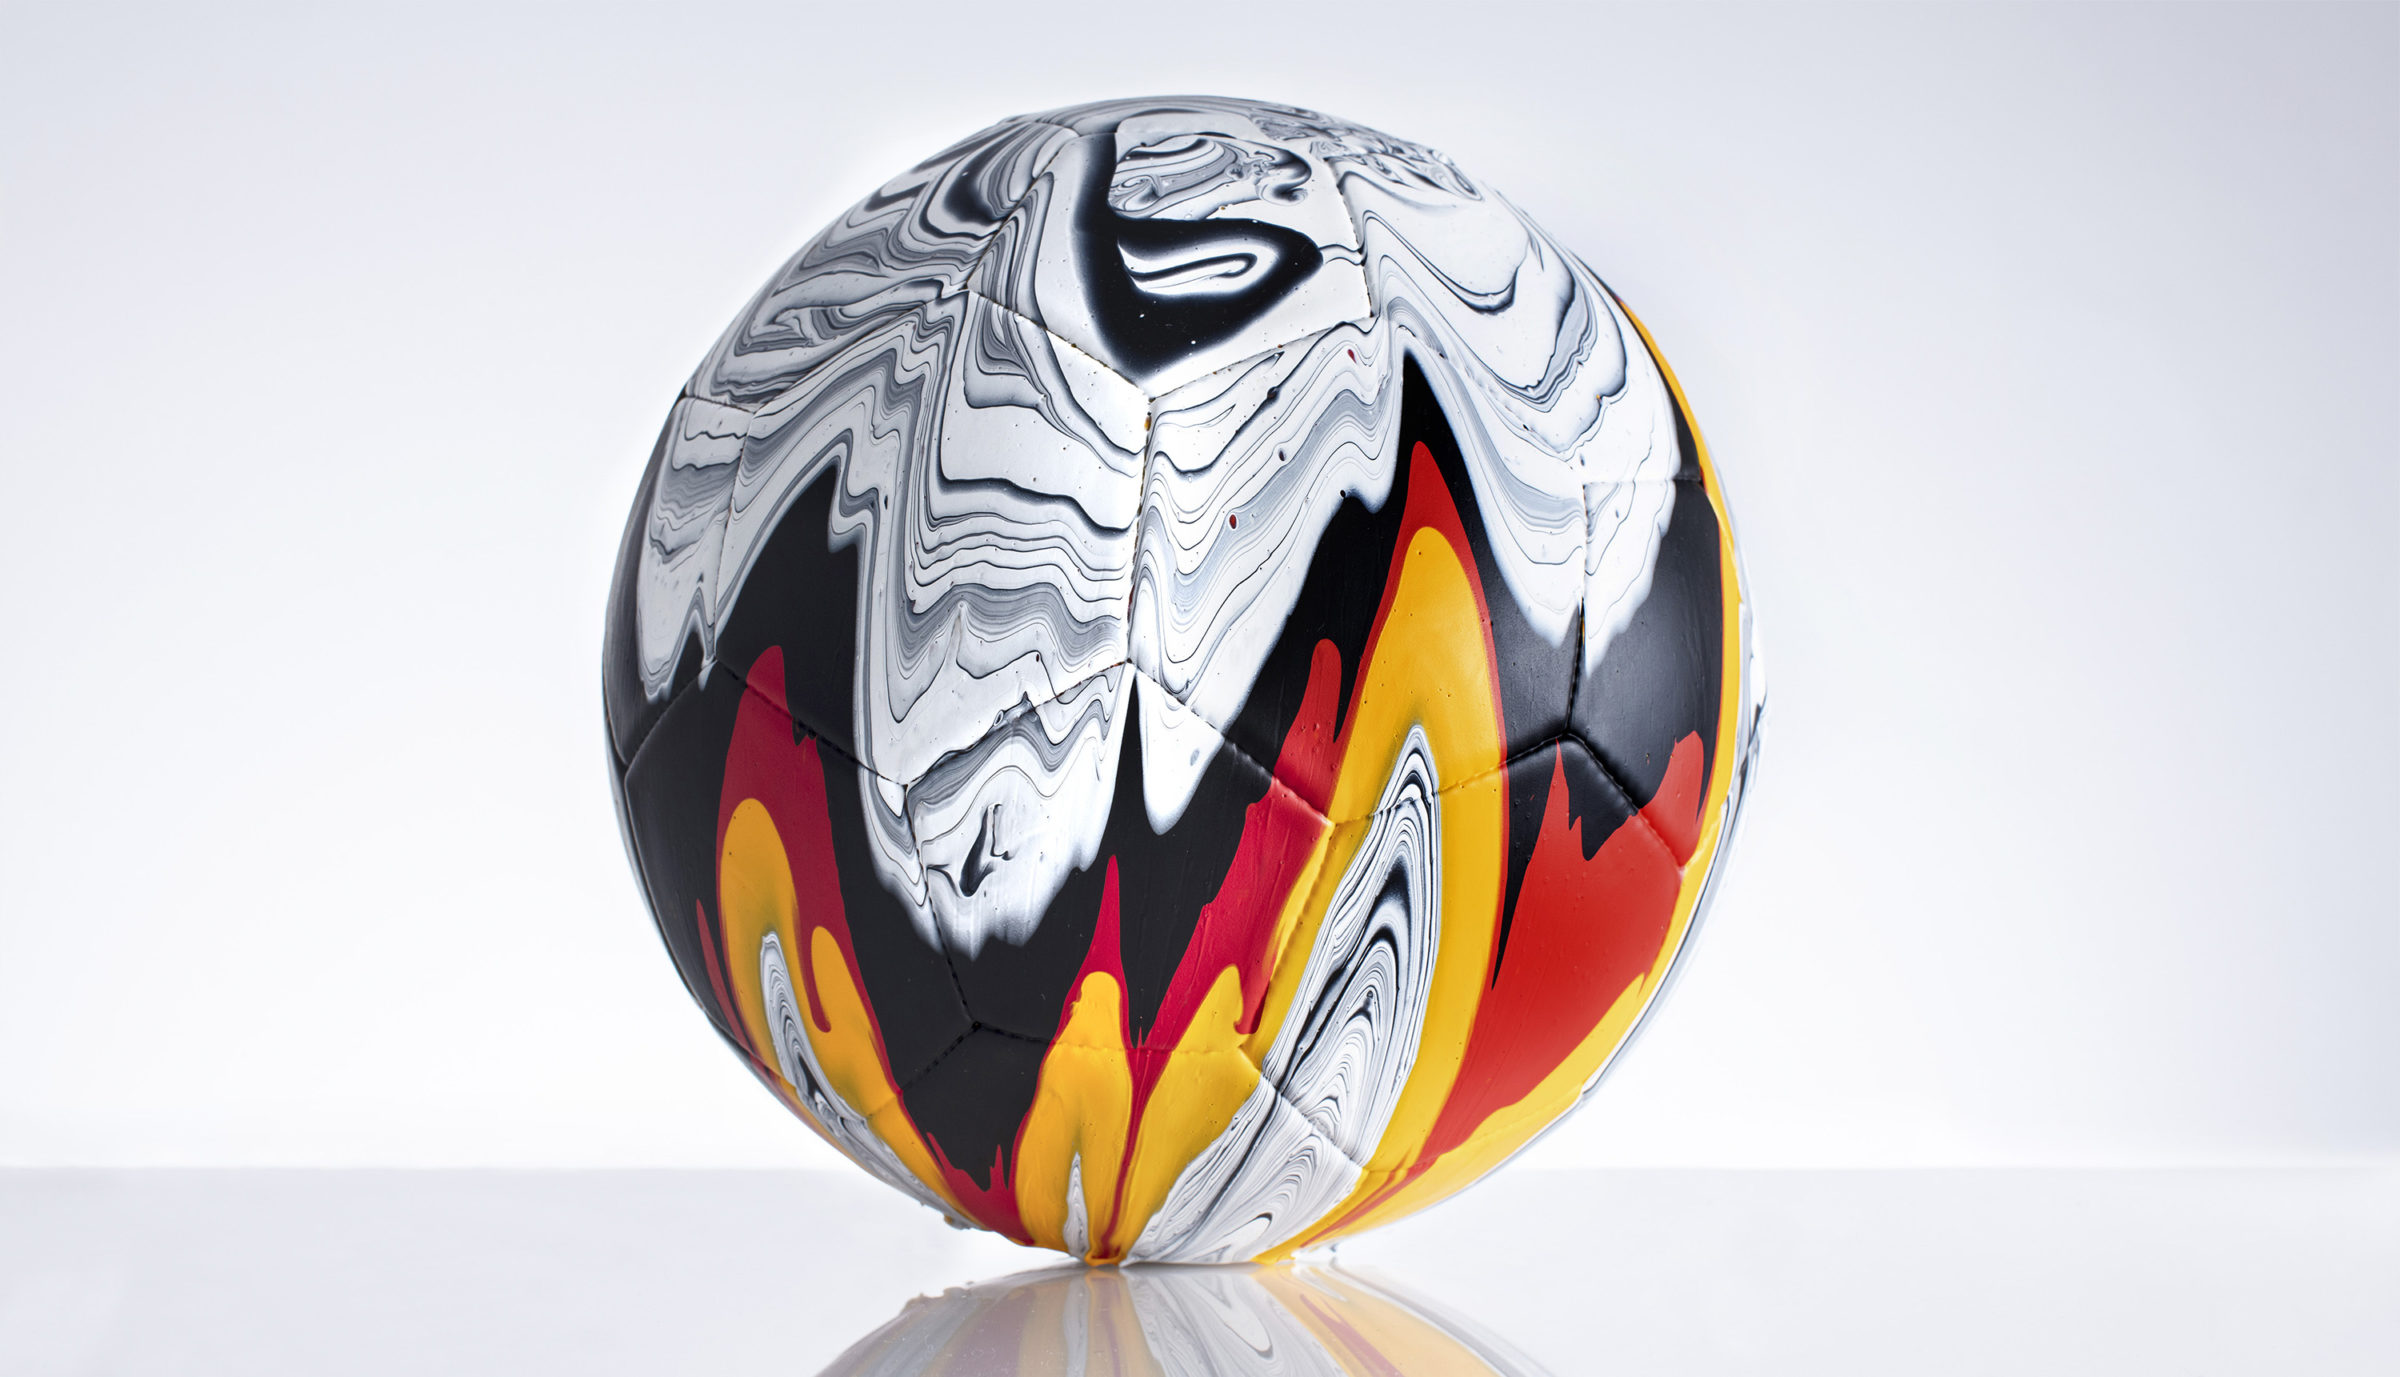 Craig Black x The Fusion Series Footballs Acrylic Fusion Football Art Installation 01 Germany